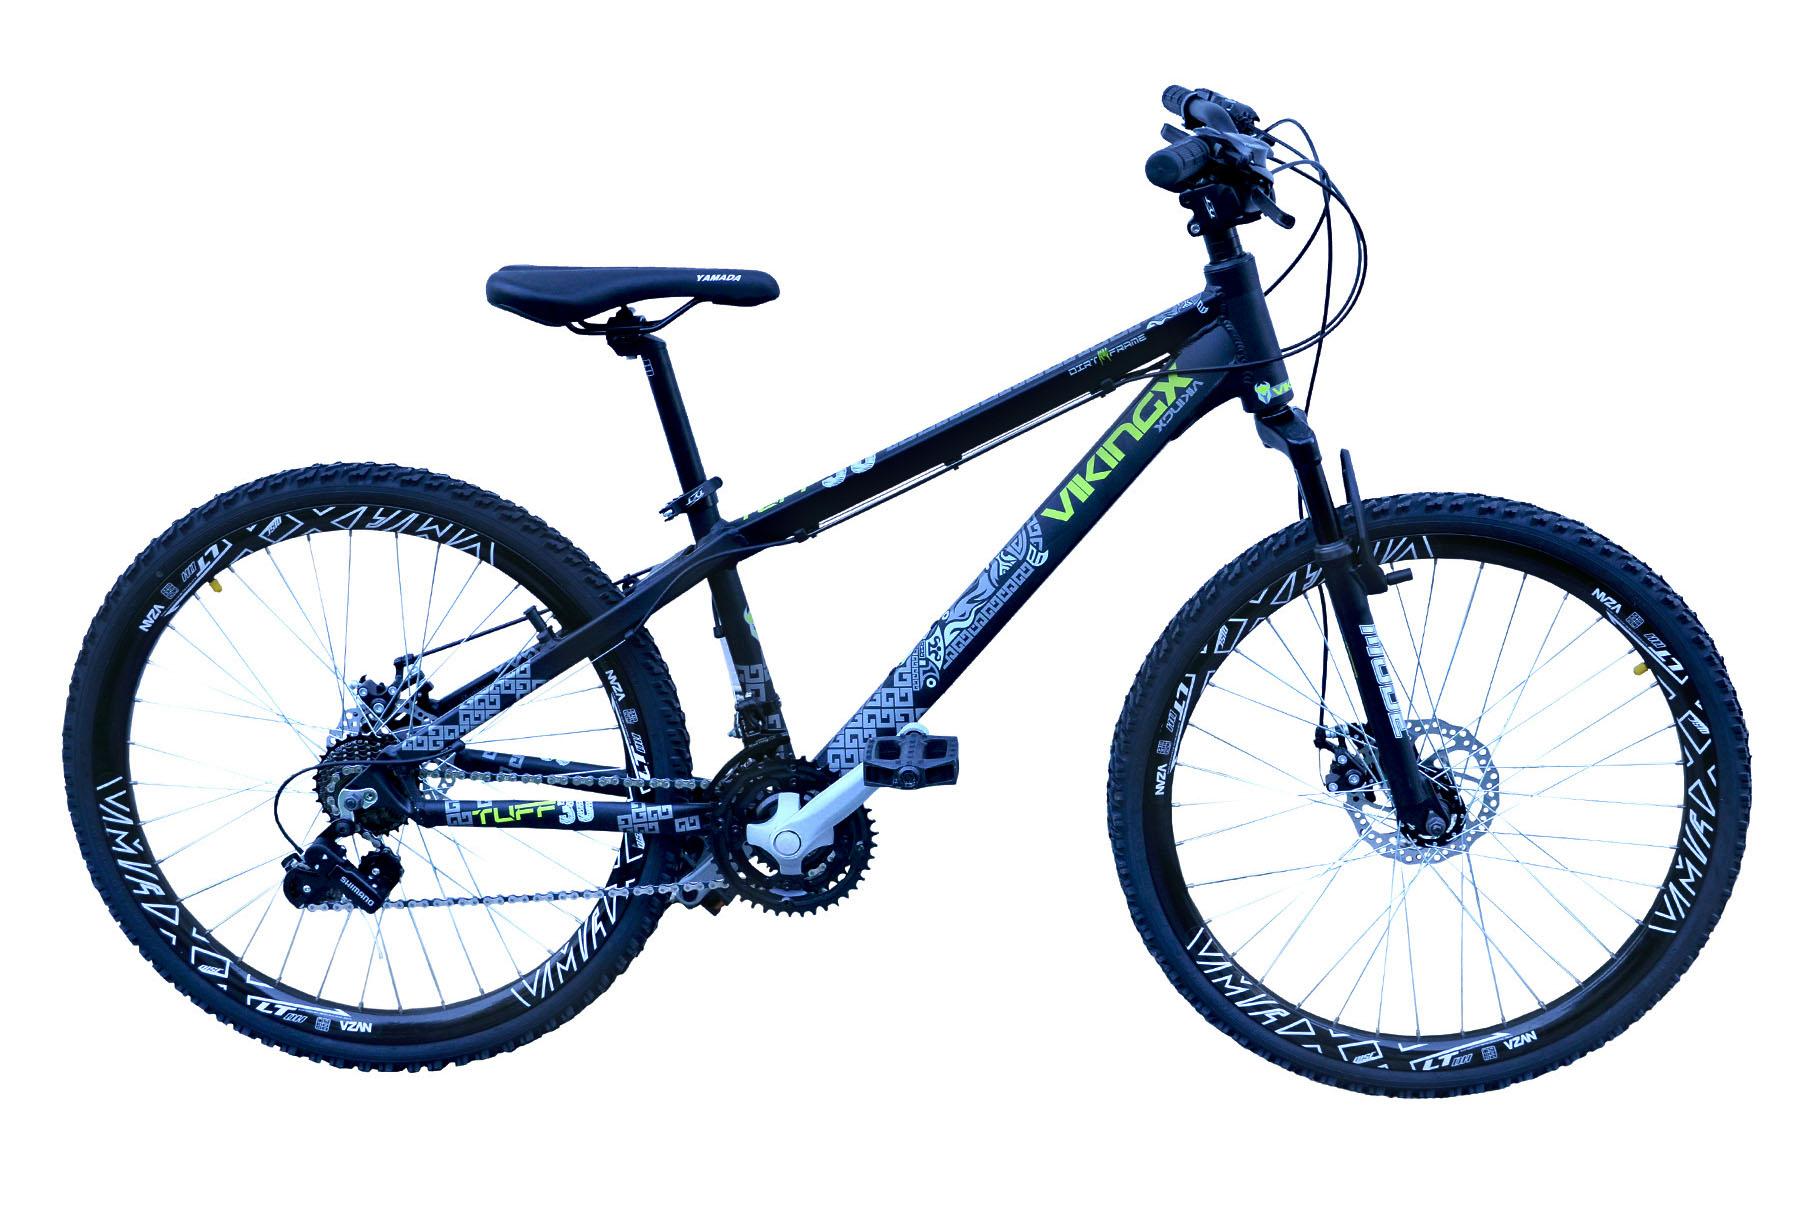 Bicicleta Freeride Passeio Viking 21v Aro 26 - Preto